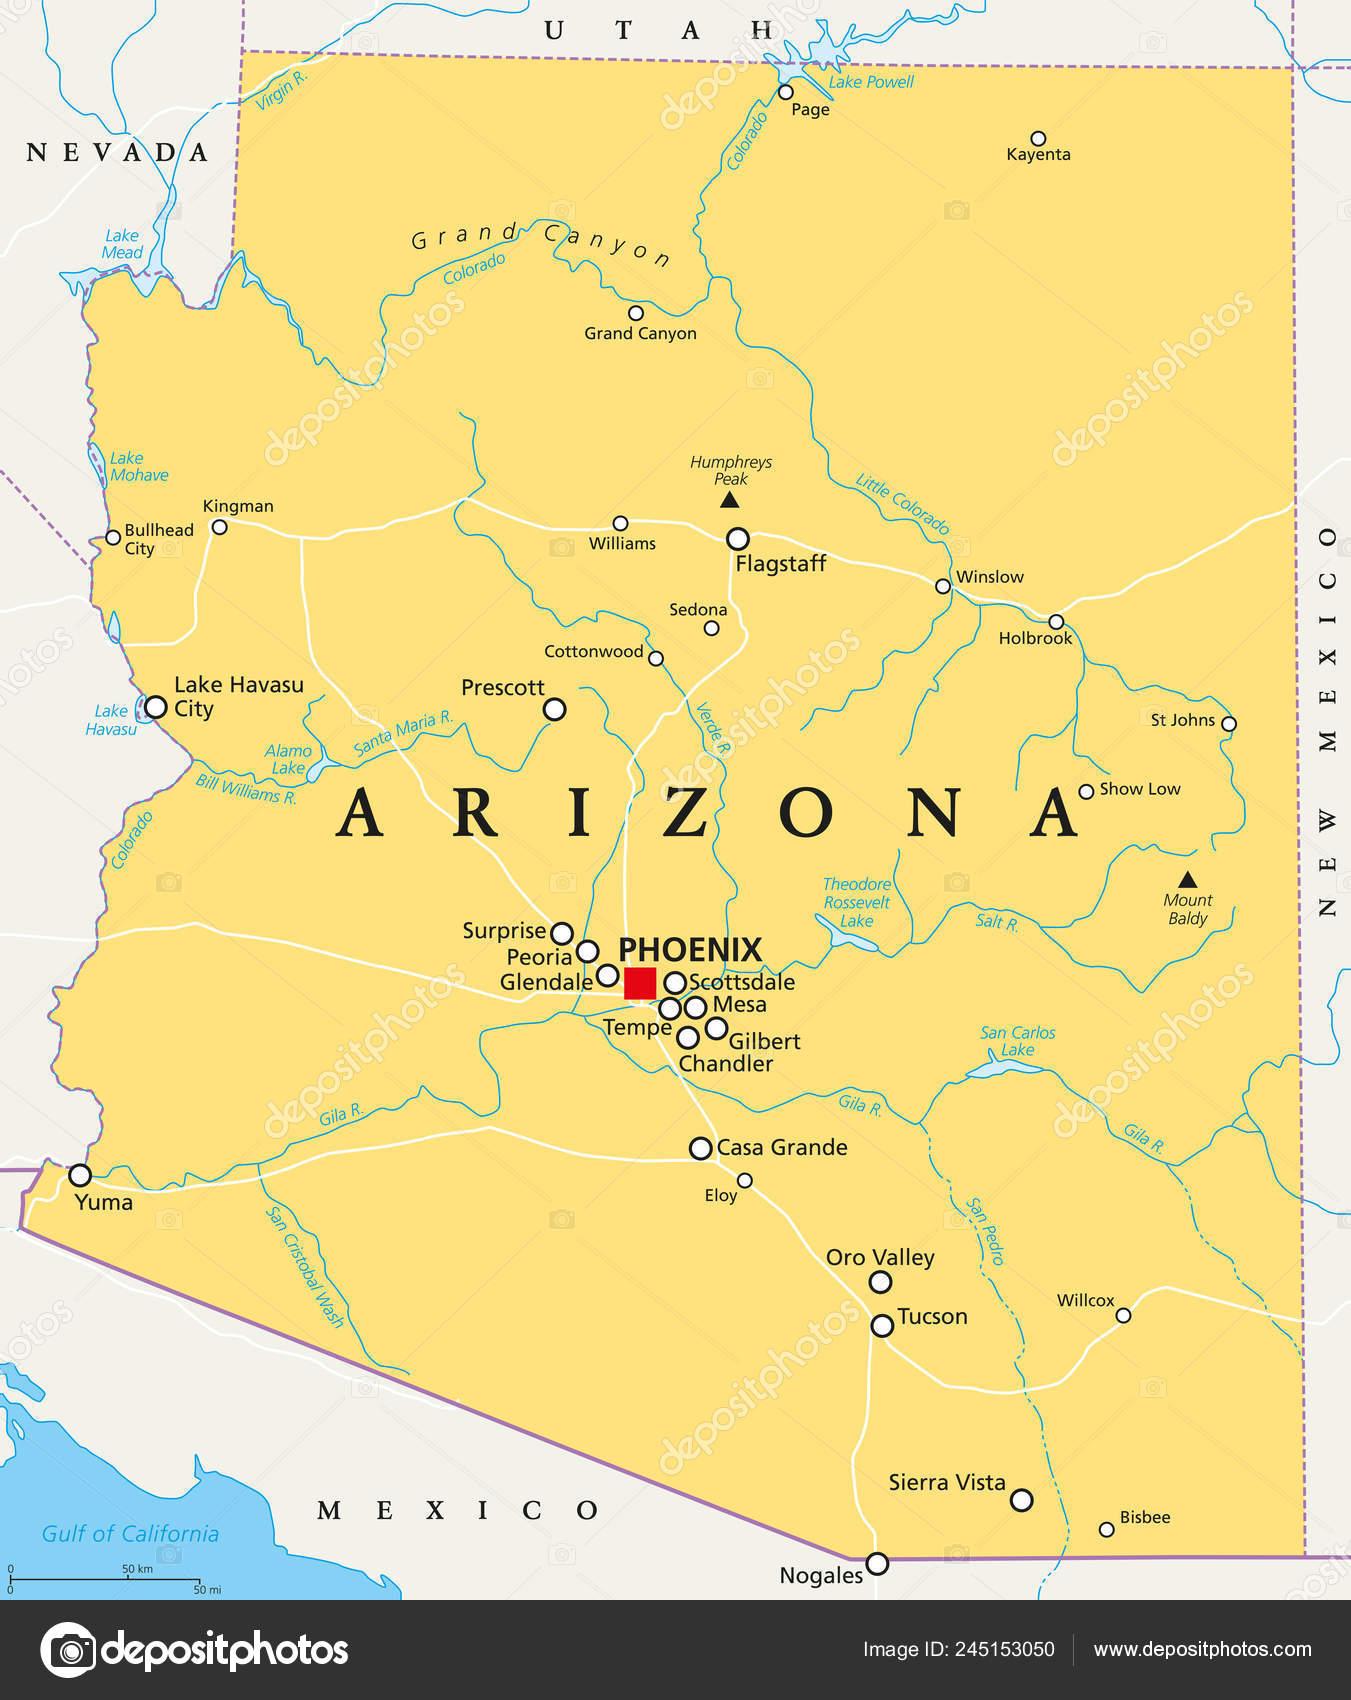 Map Of Arizona Rivers.Arizona Political Map Capital Phoenix Important Cities Rivers Lakes